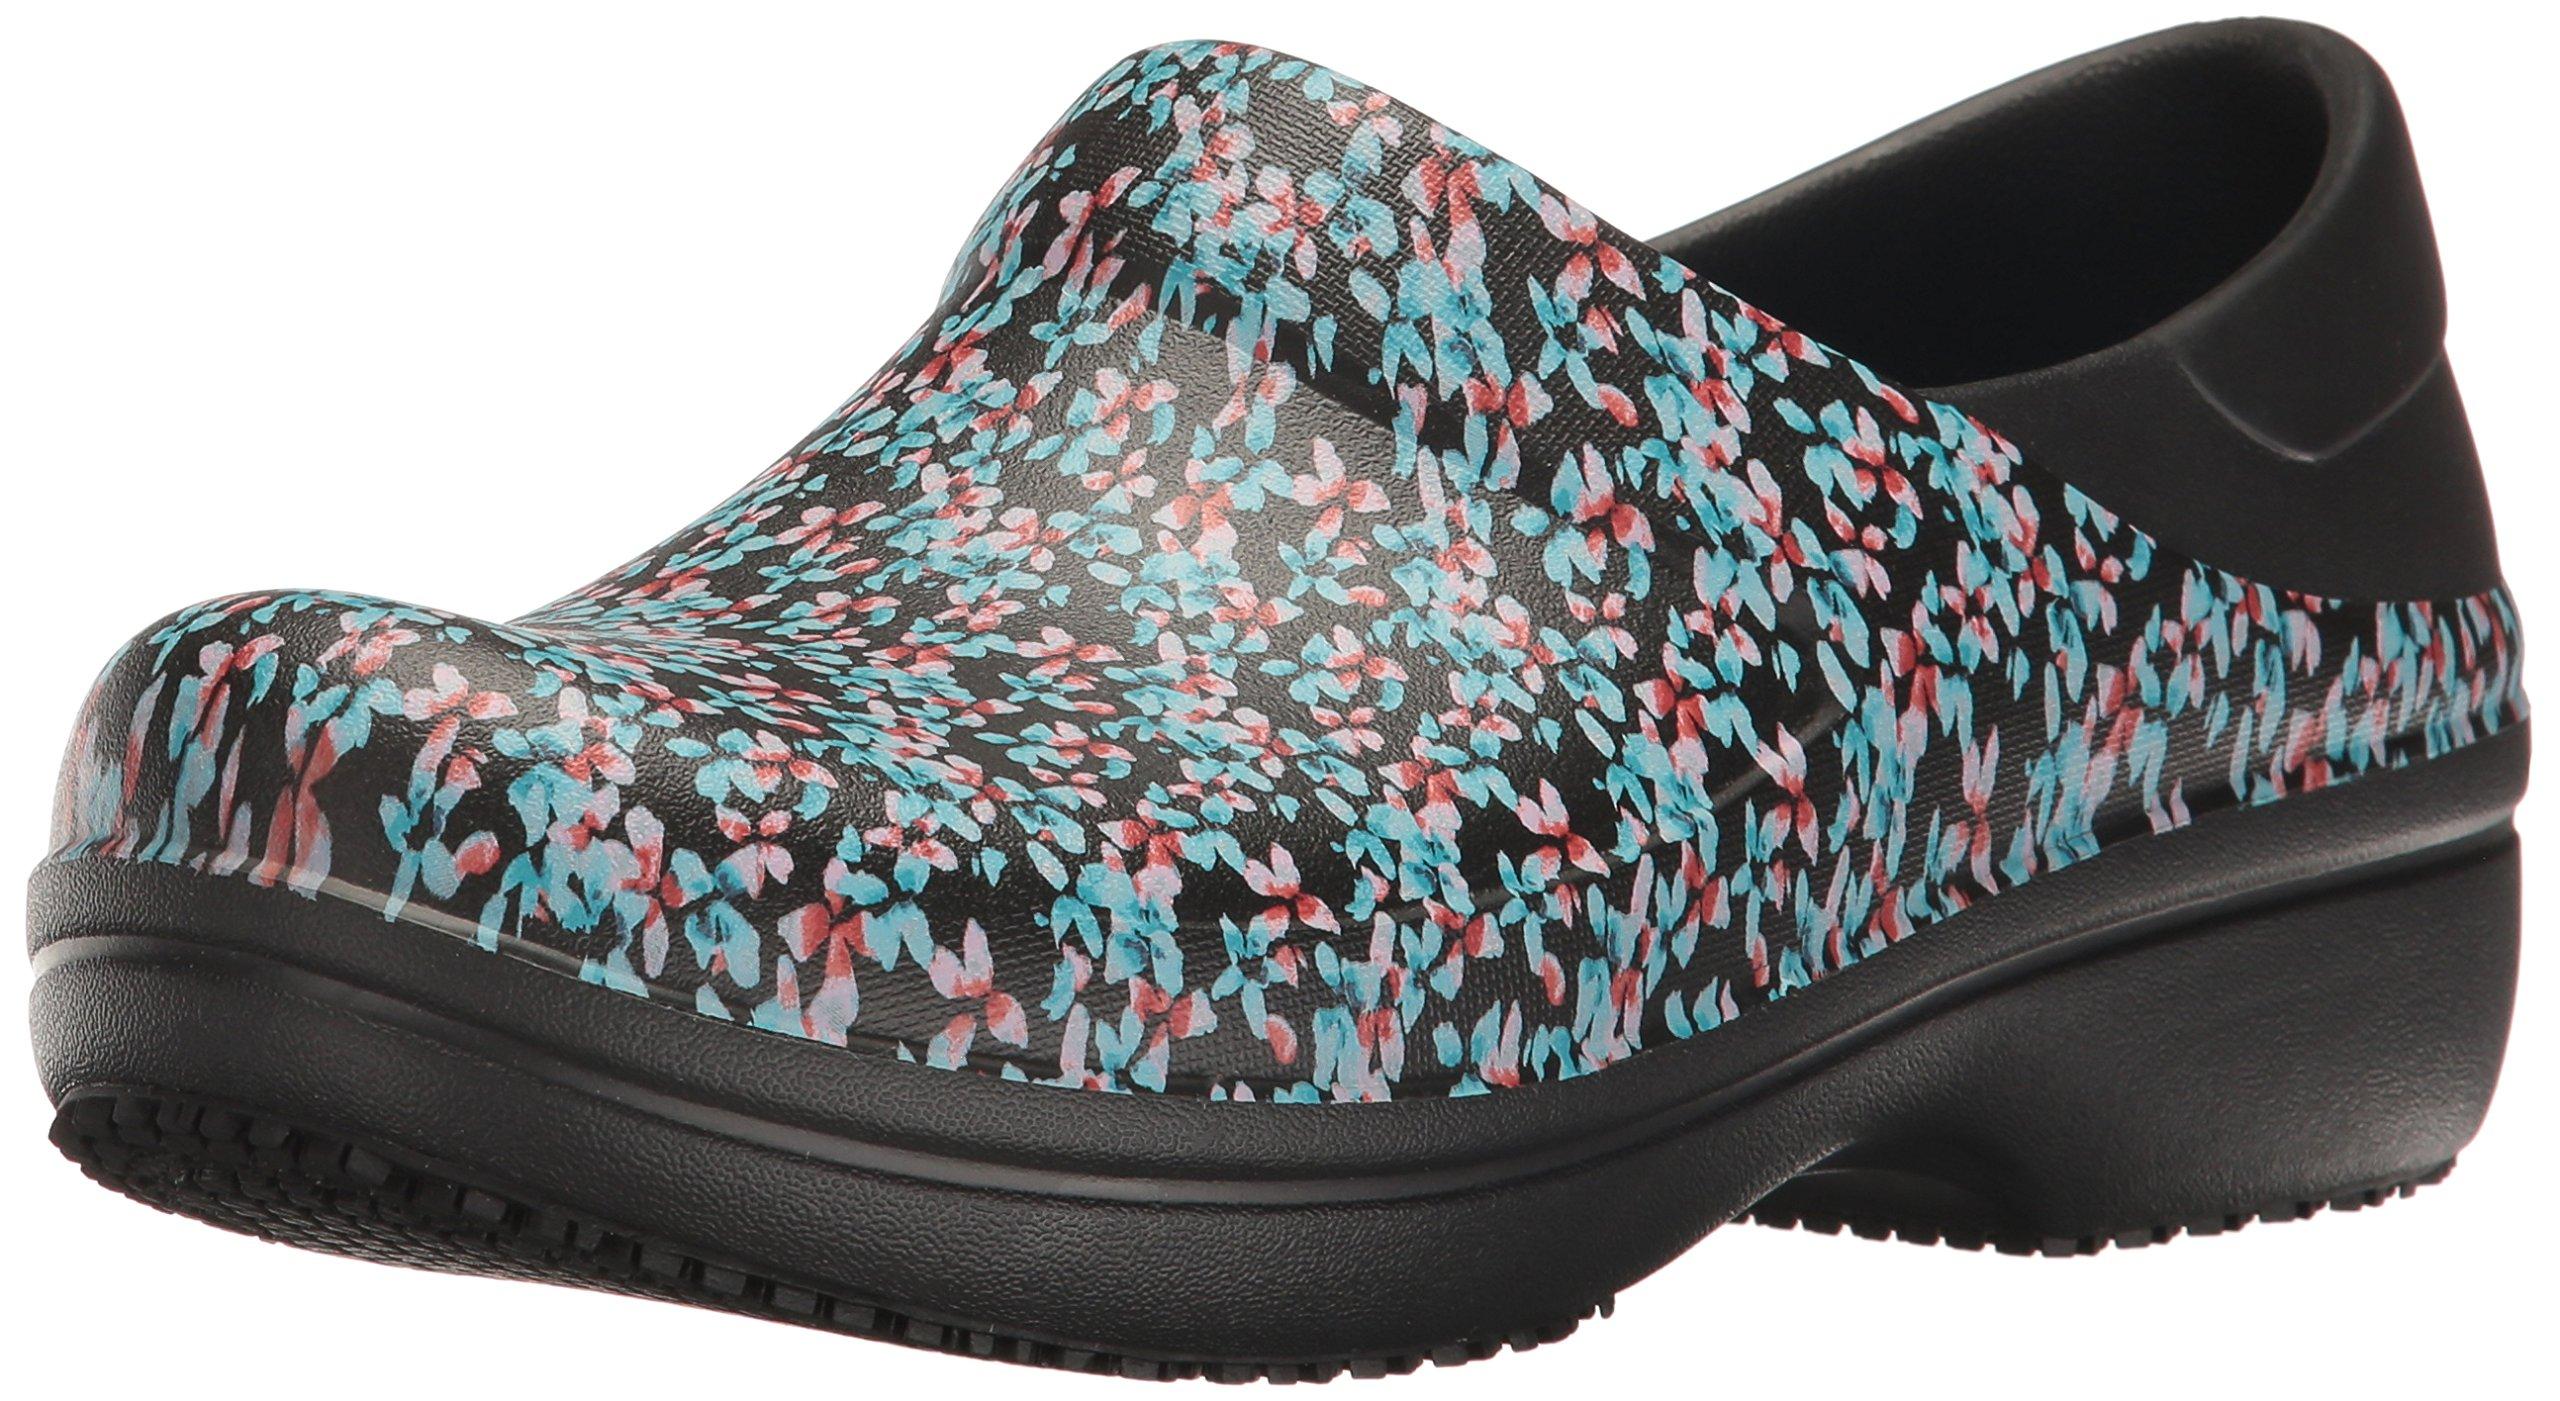 Crocs Women's Neria Pro Graphic Clog W Mule, Black/Ice Blue, 7 M US